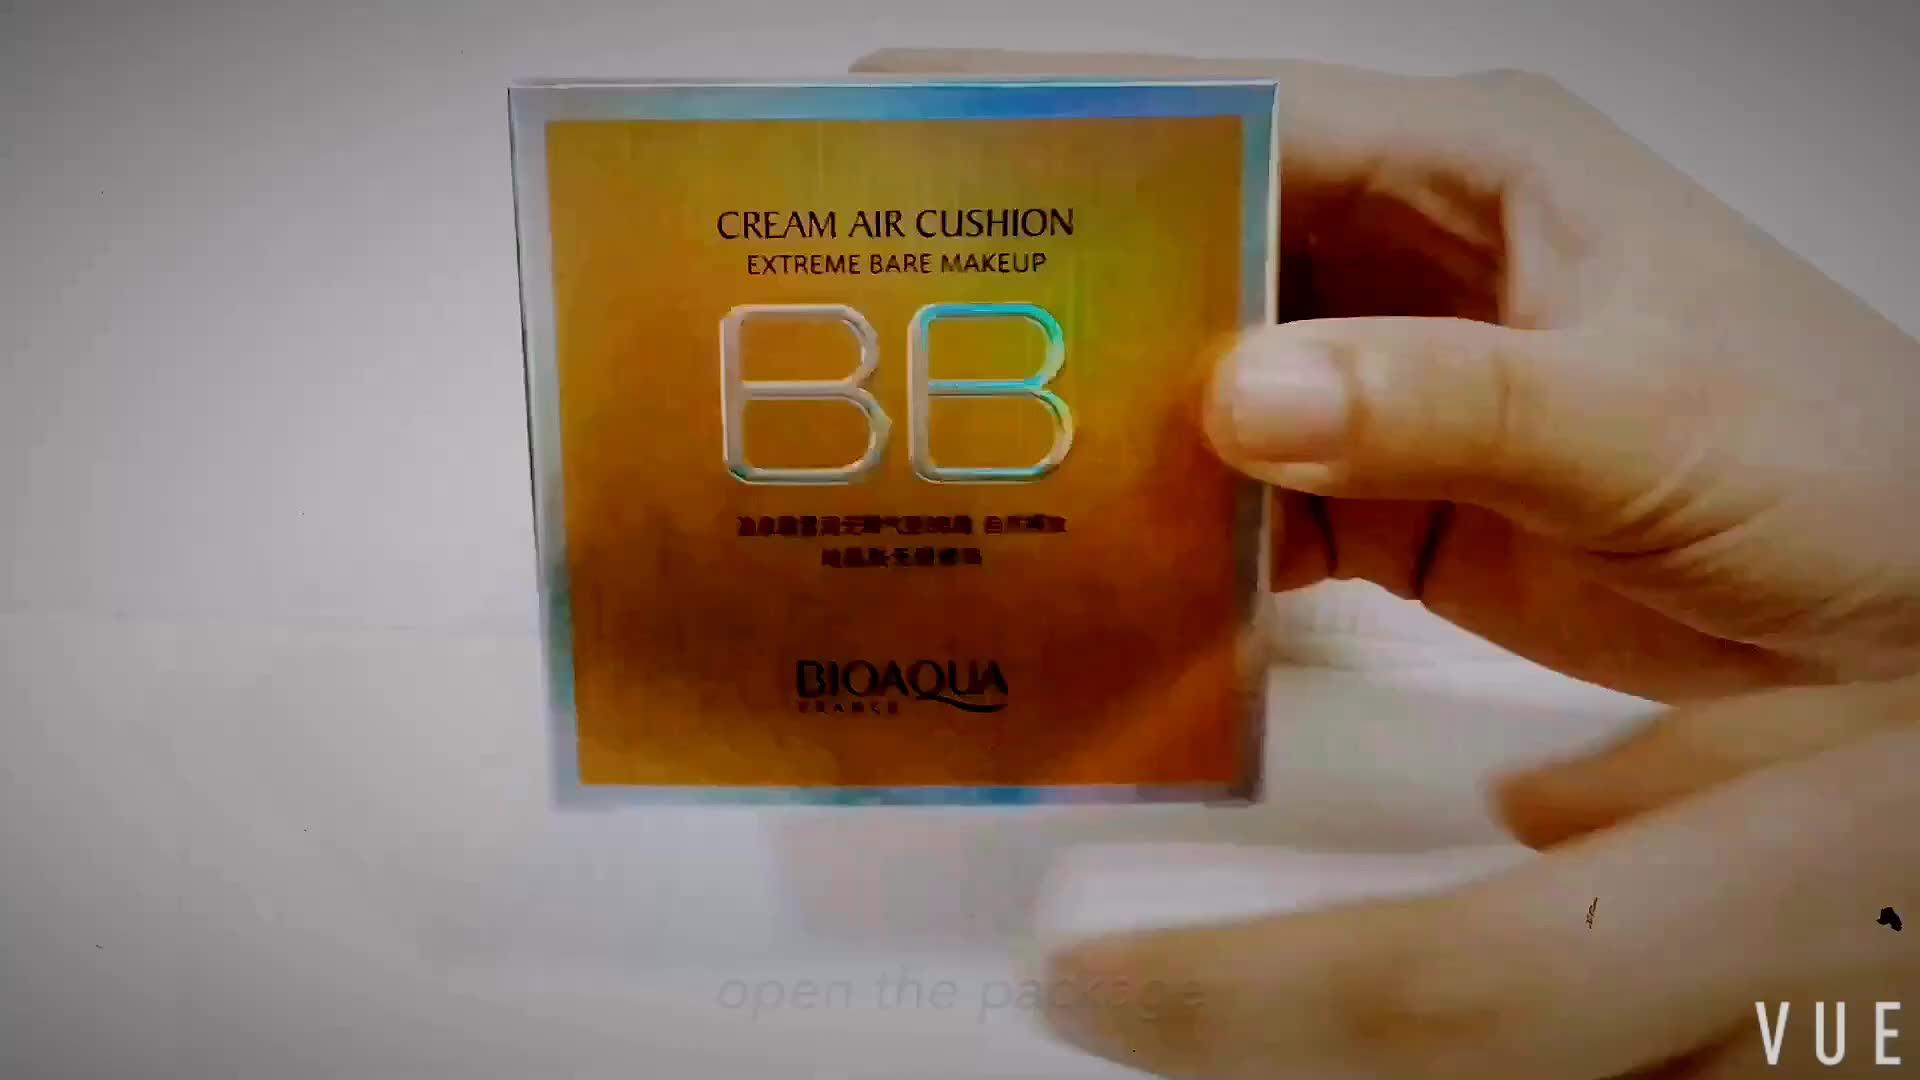 Oem Odm Bioaqua Air Cushion Cc Cream For Skin Care Concealer Smooth Bio Aqua Aircusion Moisturizing Compact Foundation